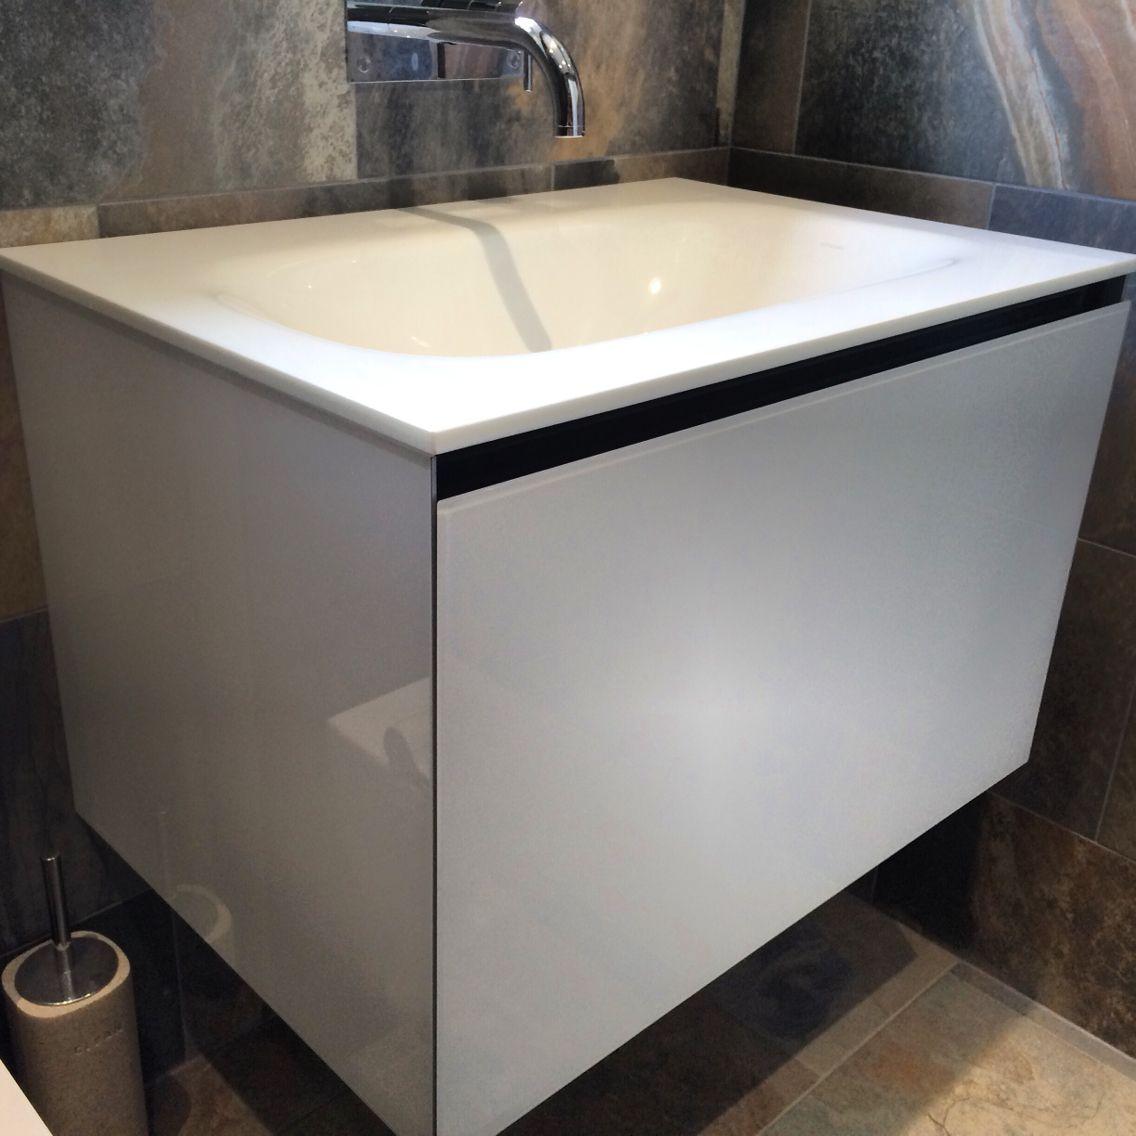 Eaudace Salle De Bain Longueuil ~ artelinea domino 75 basin installed by aquanero bathroom design